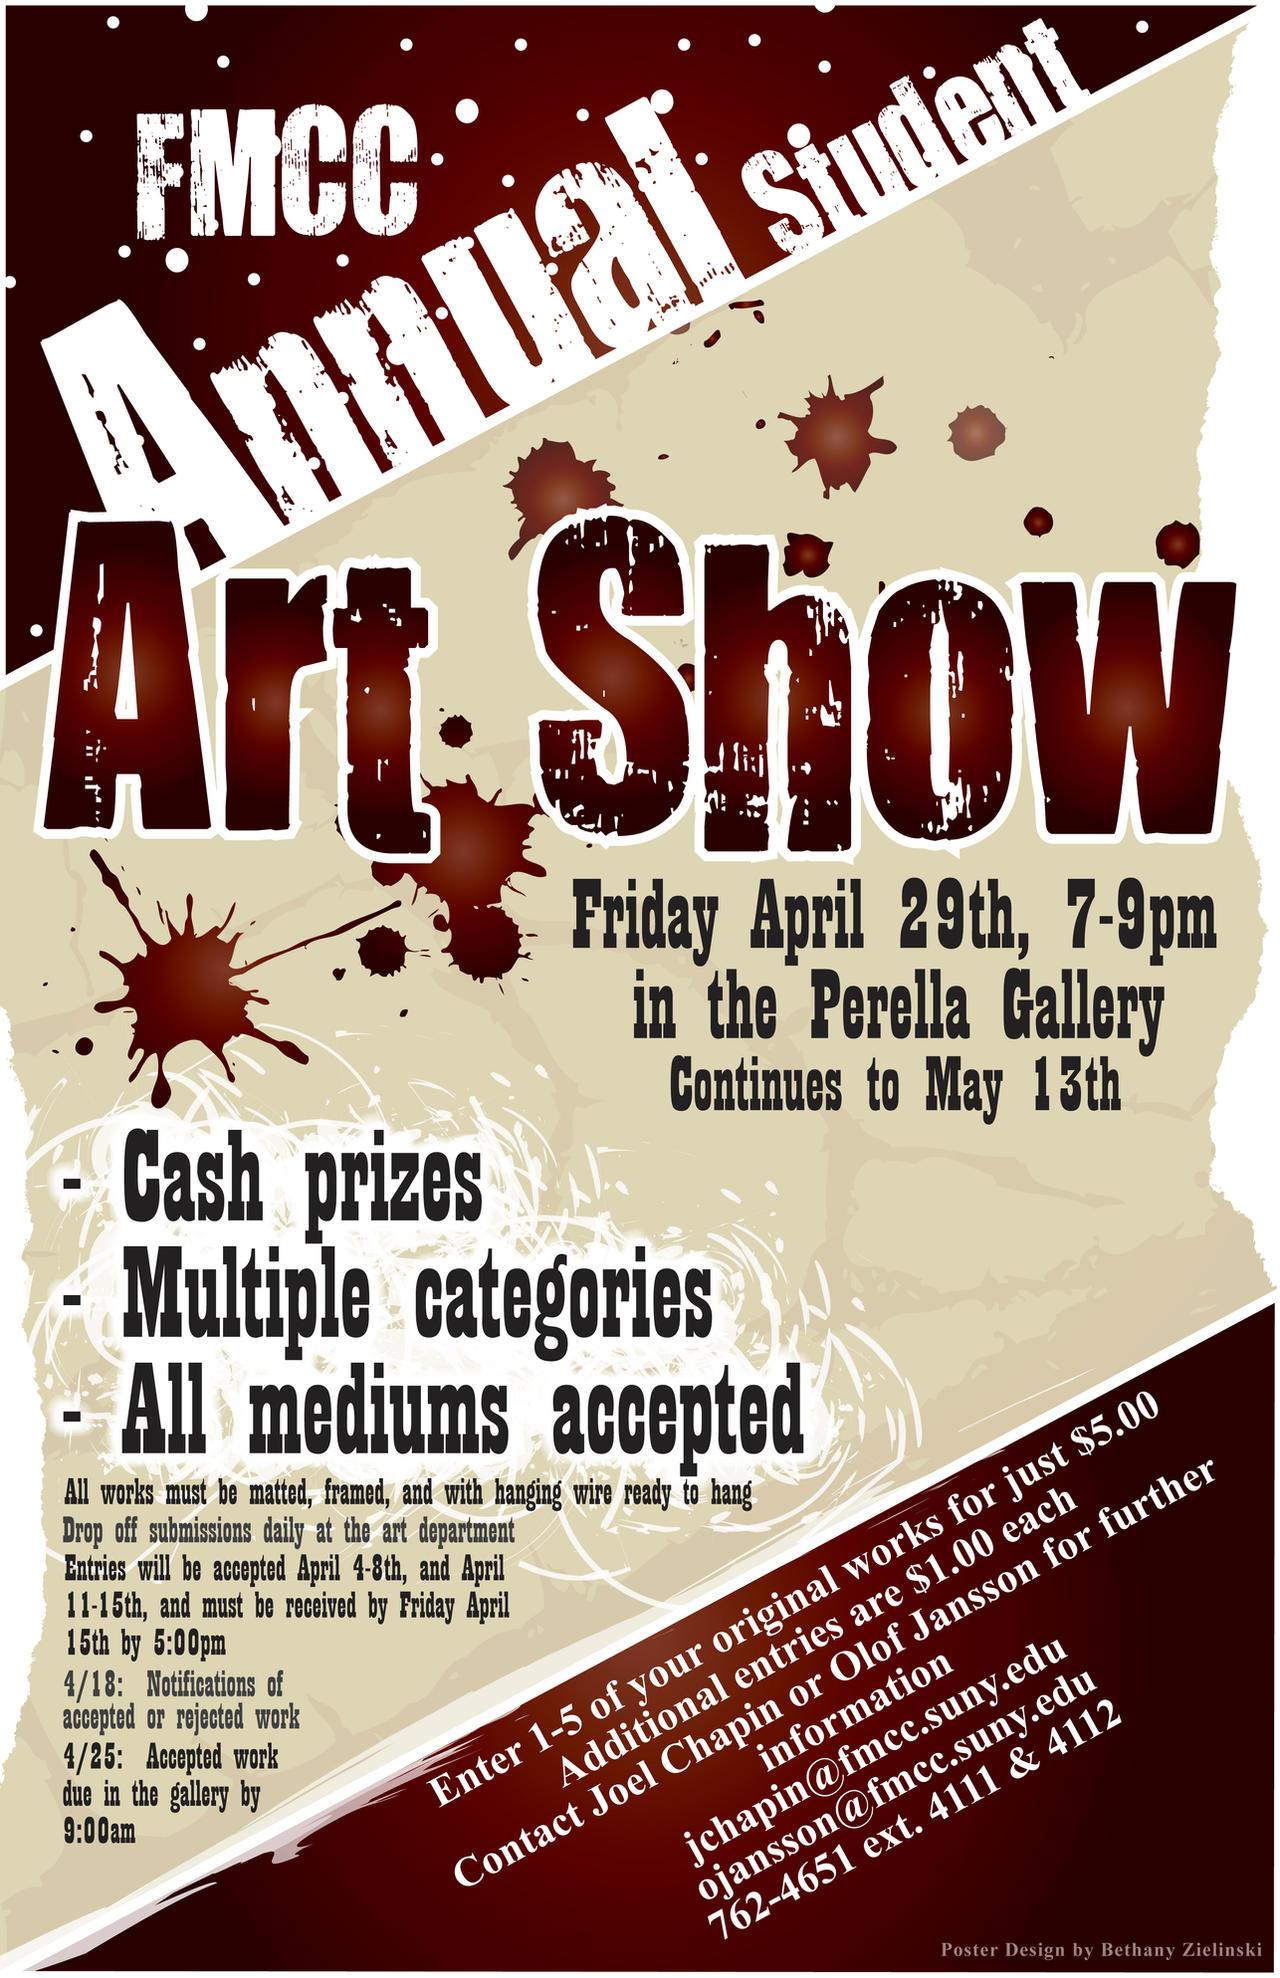 Poster design gallery -  Fmcc Art Show Poster Design By Blacke Horse Design